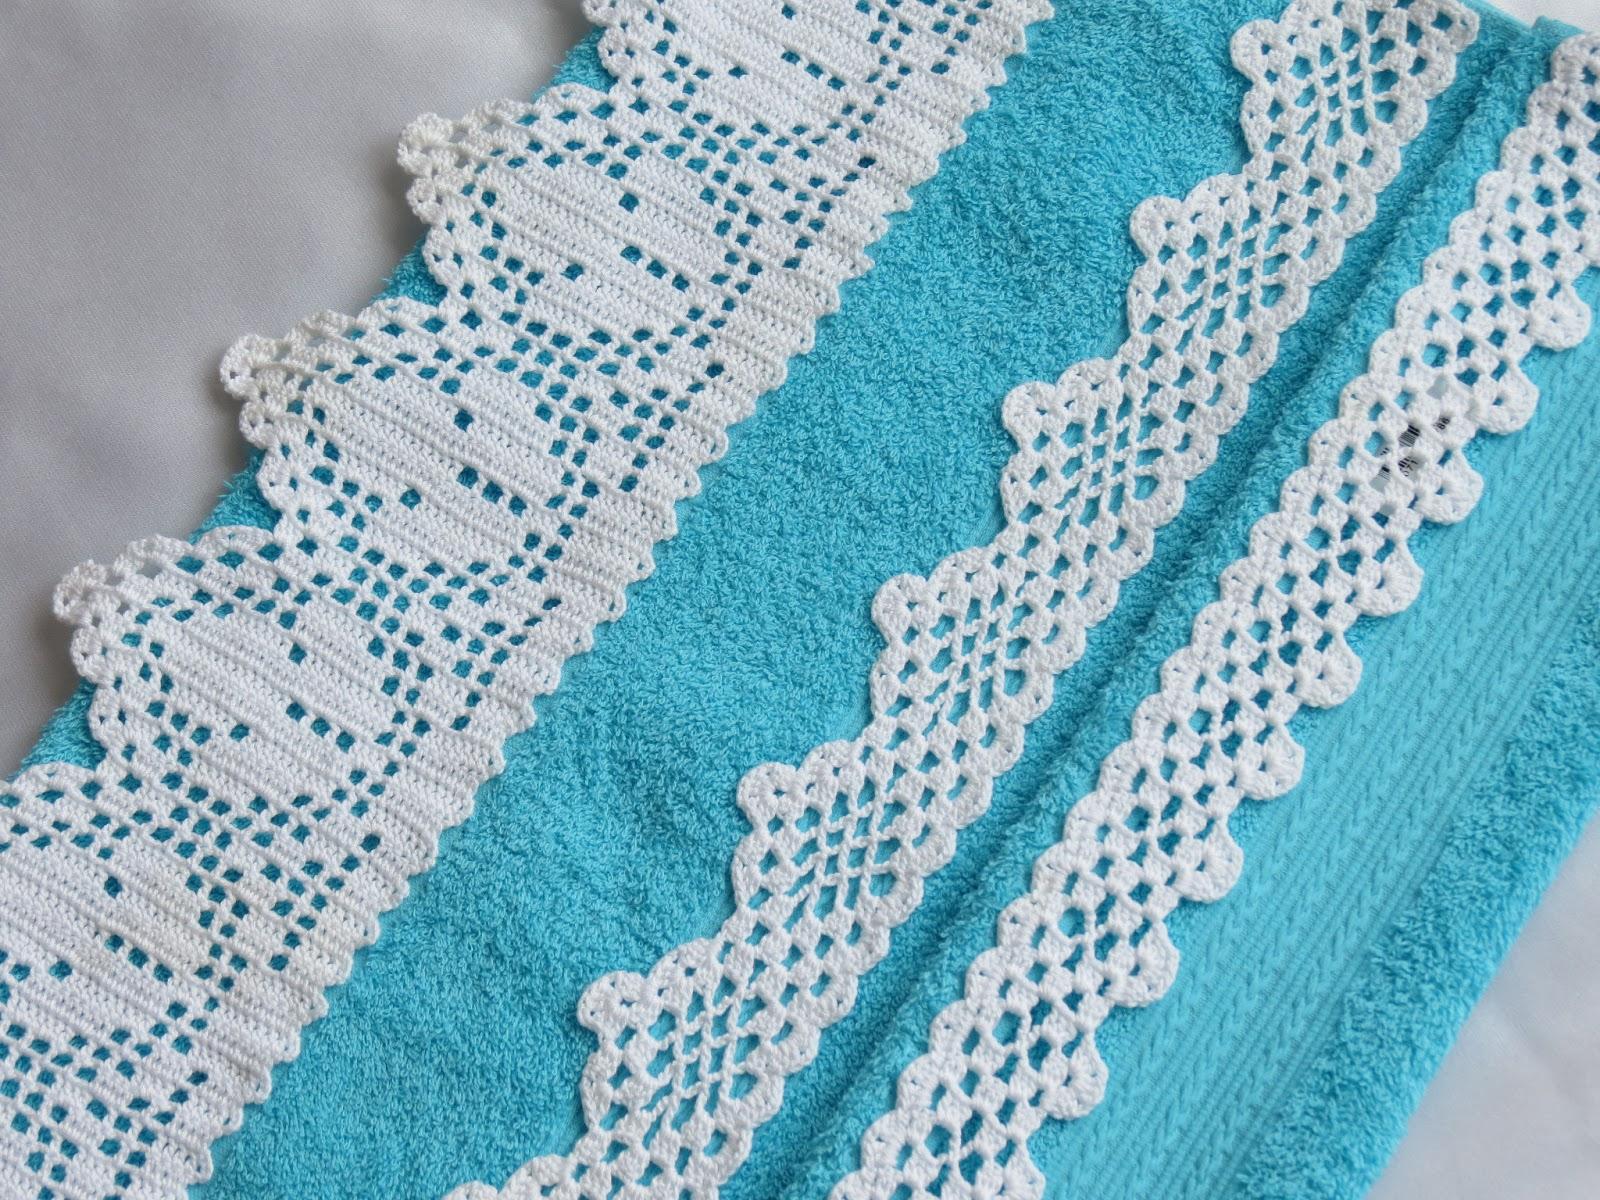 кайма крючком на полотенце схема